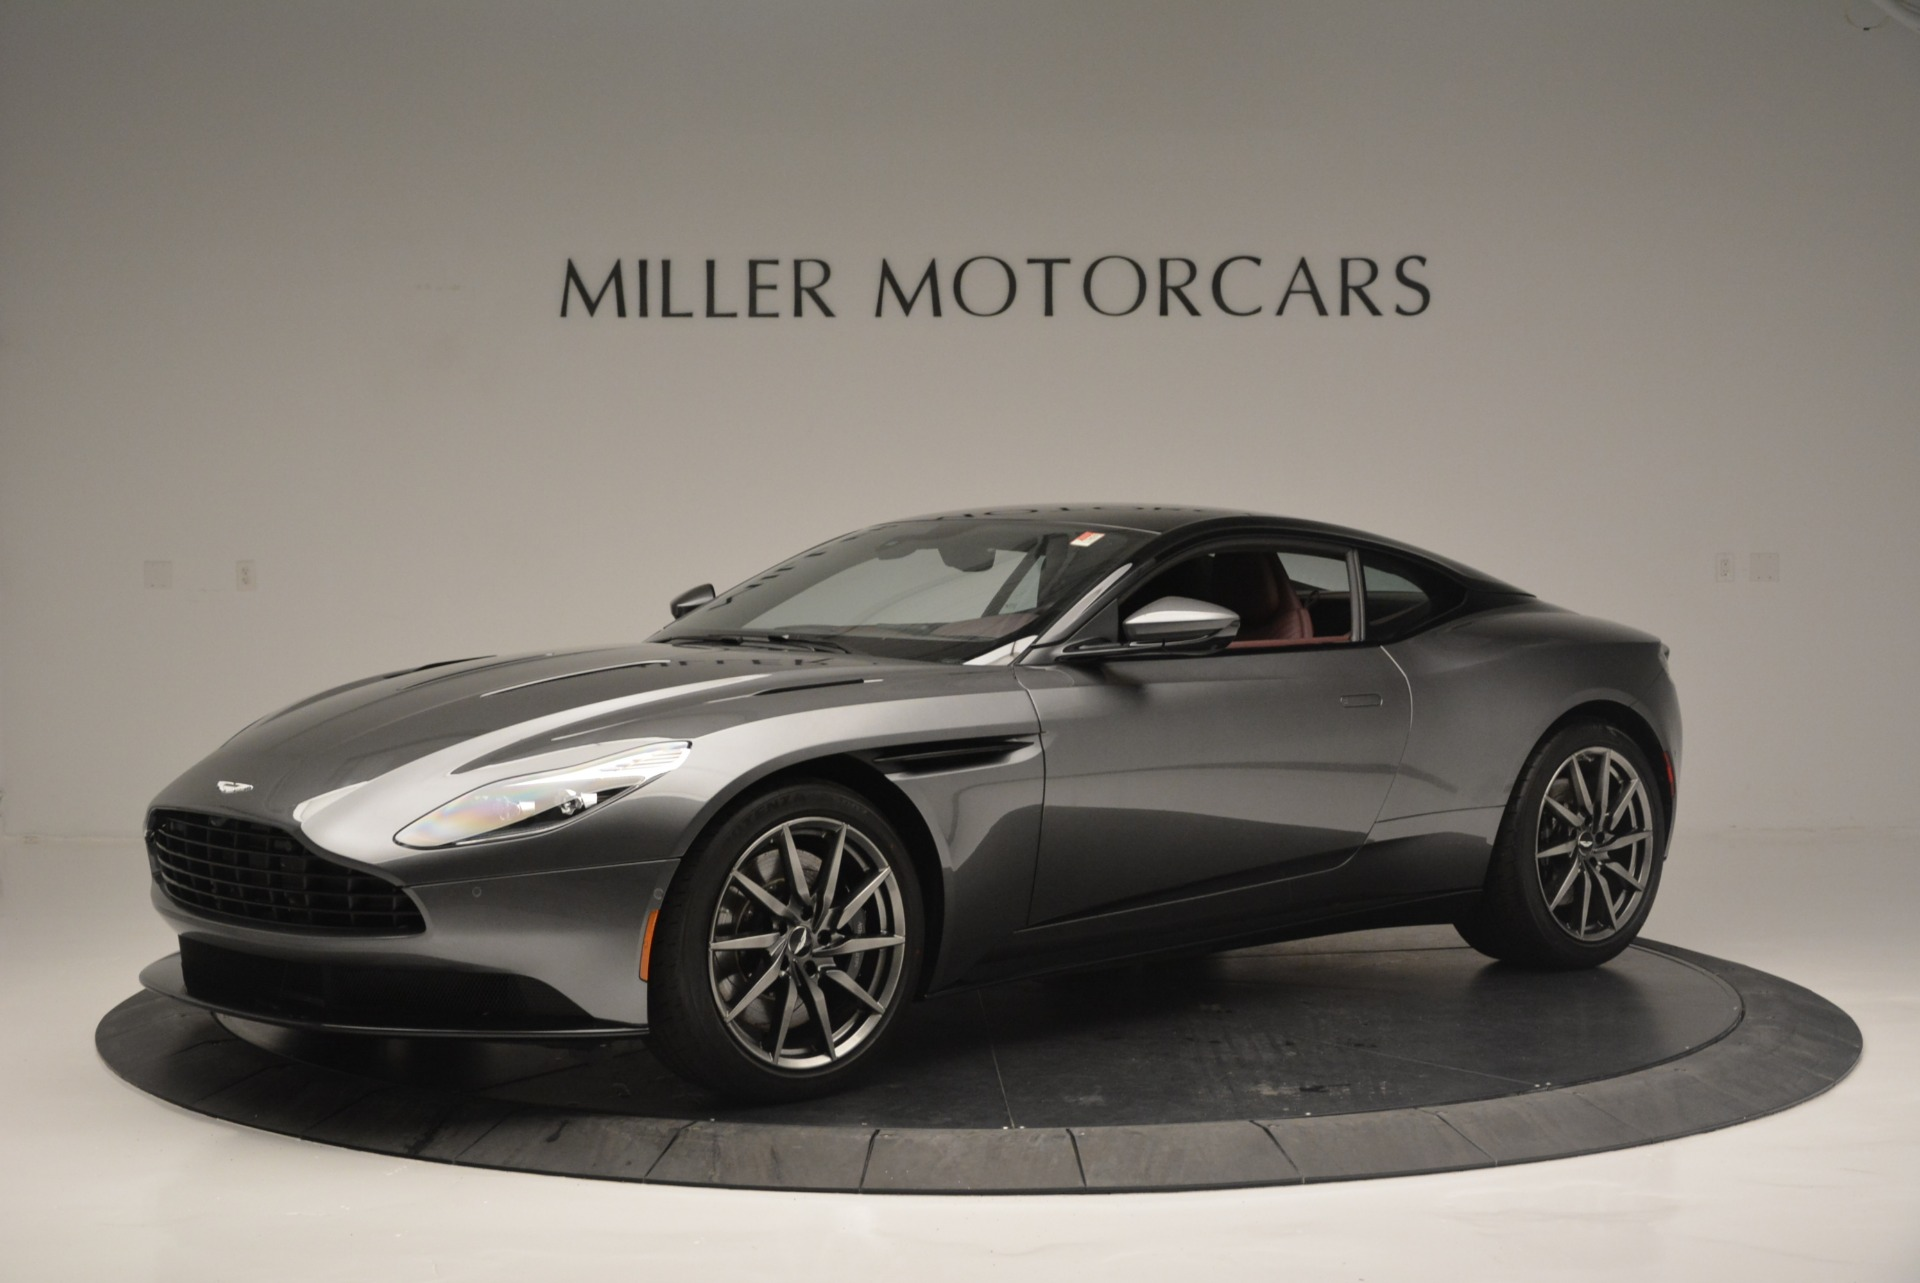 Used 2018 Aston Martin DB11 V12 for sale $167,990 at Bugatti of Greenwich in Greenwich CT 06830 1